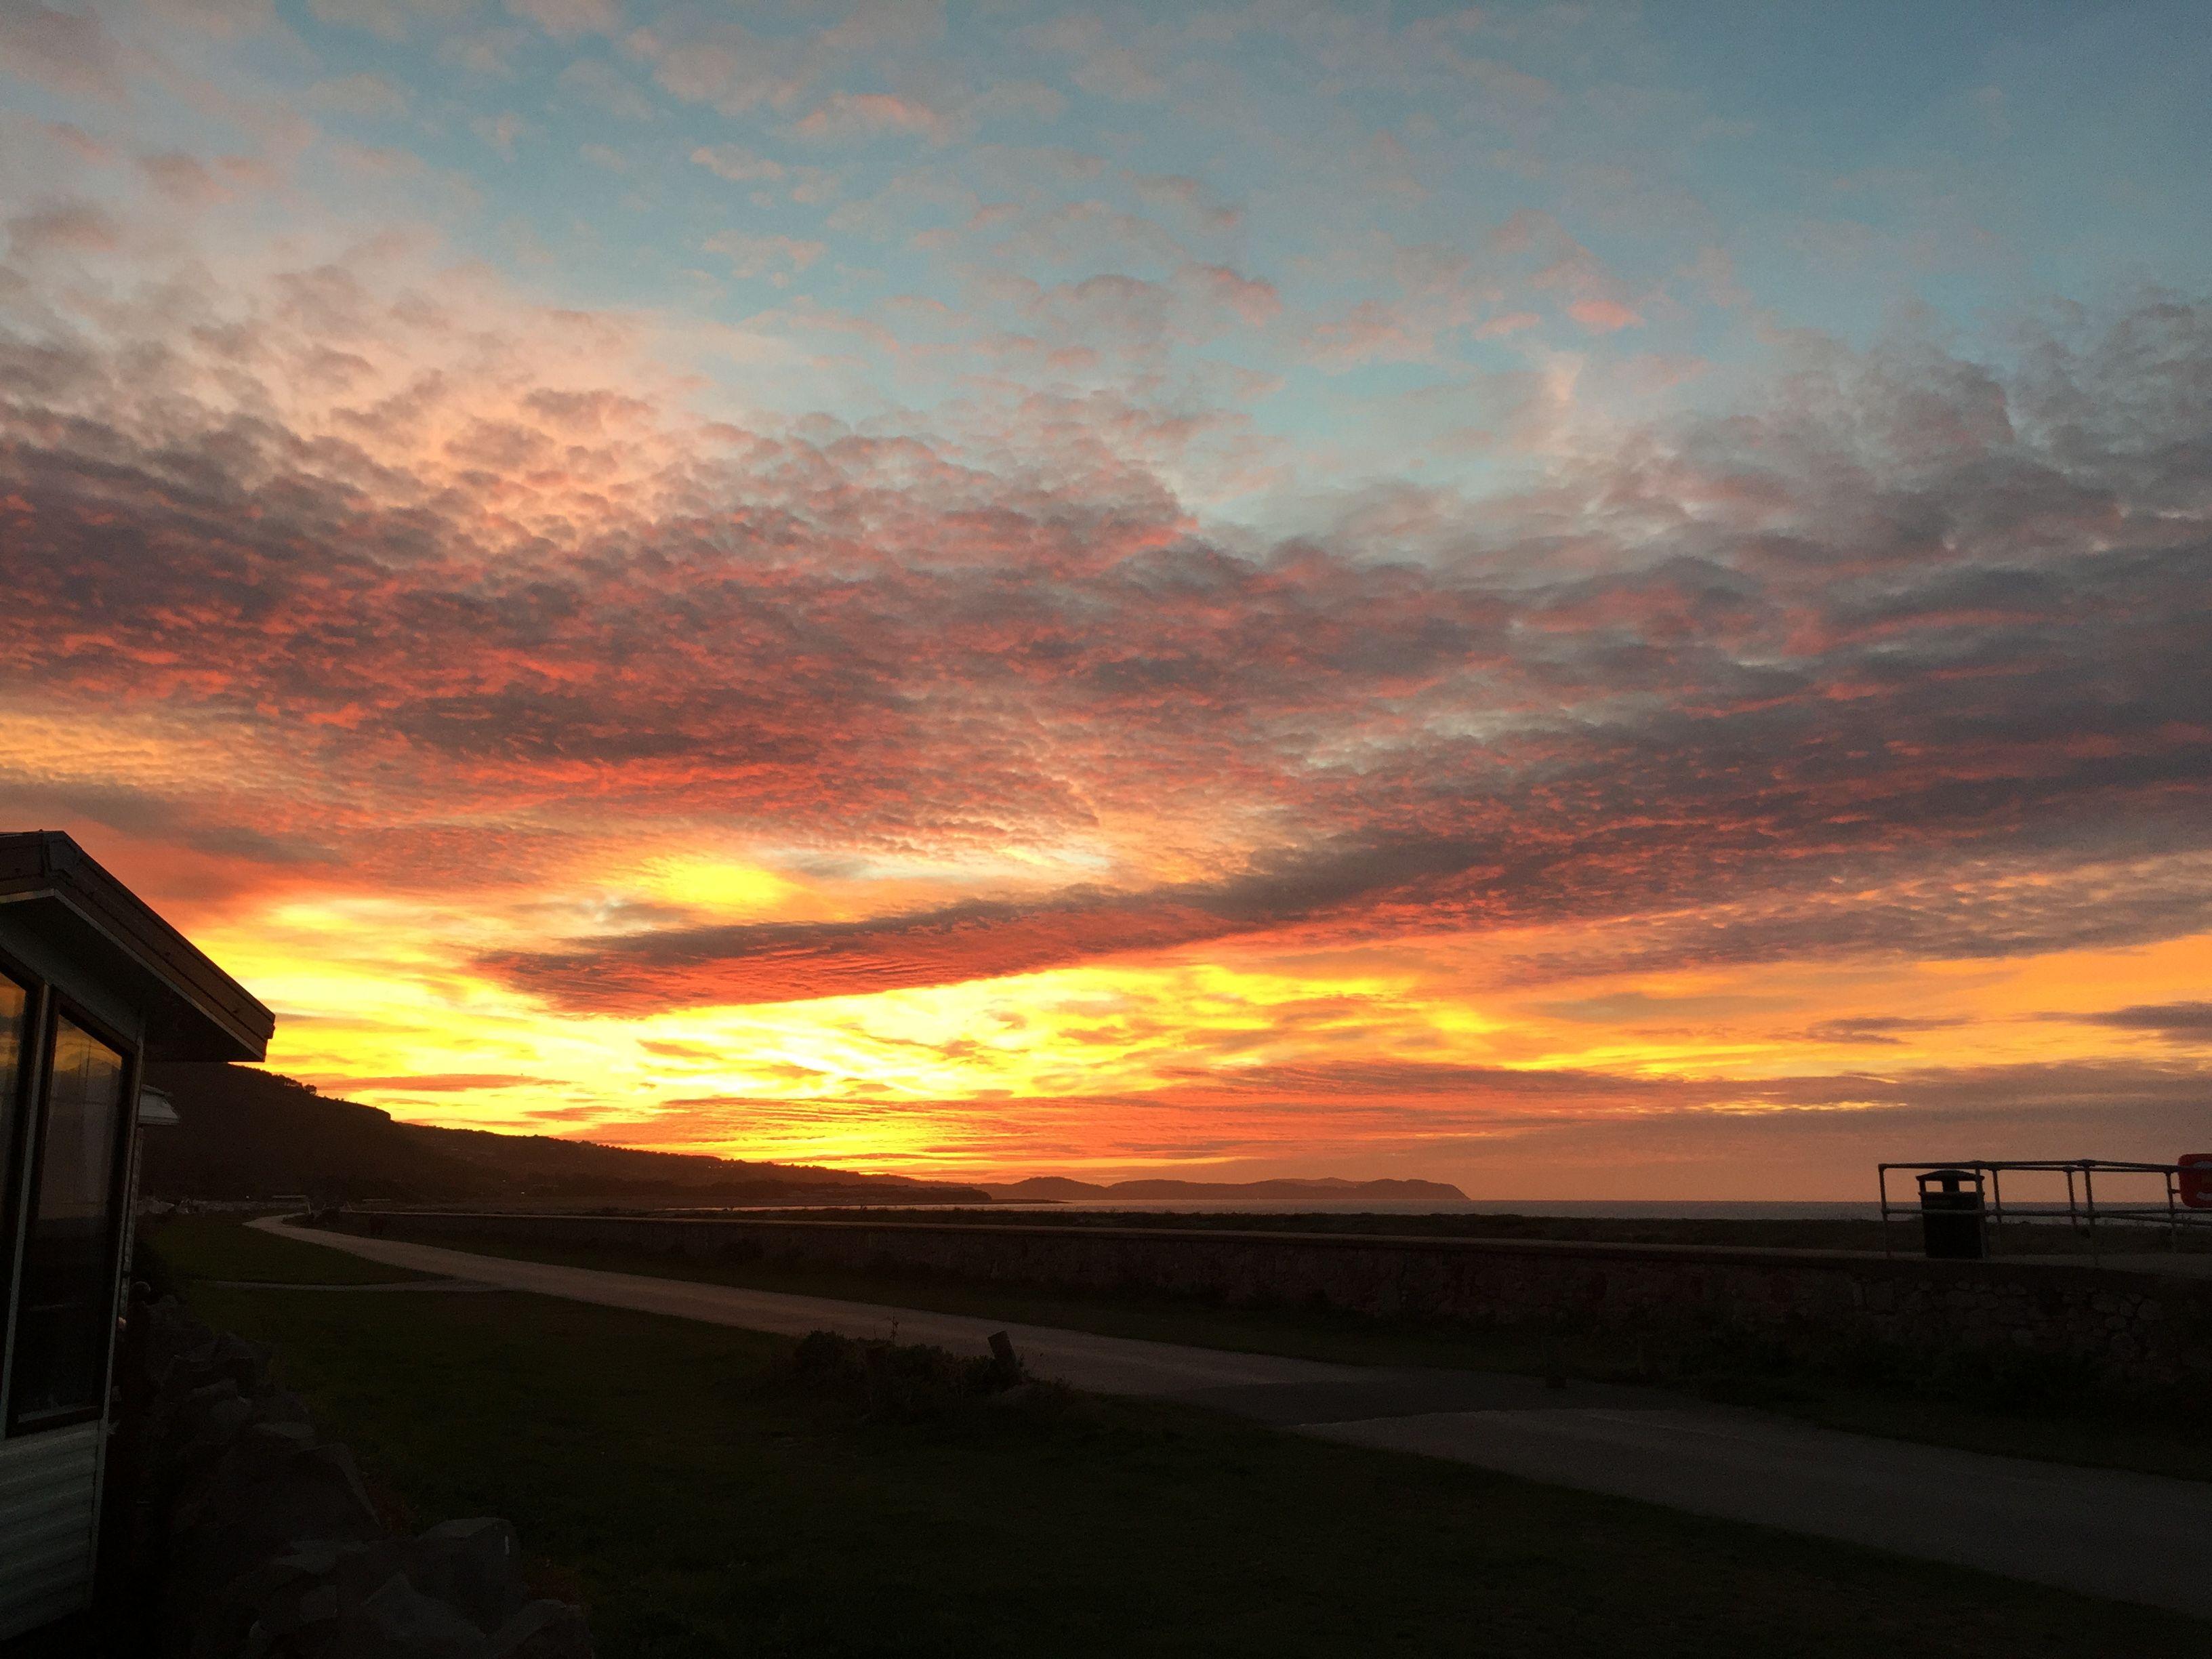 Sunset in Abergele